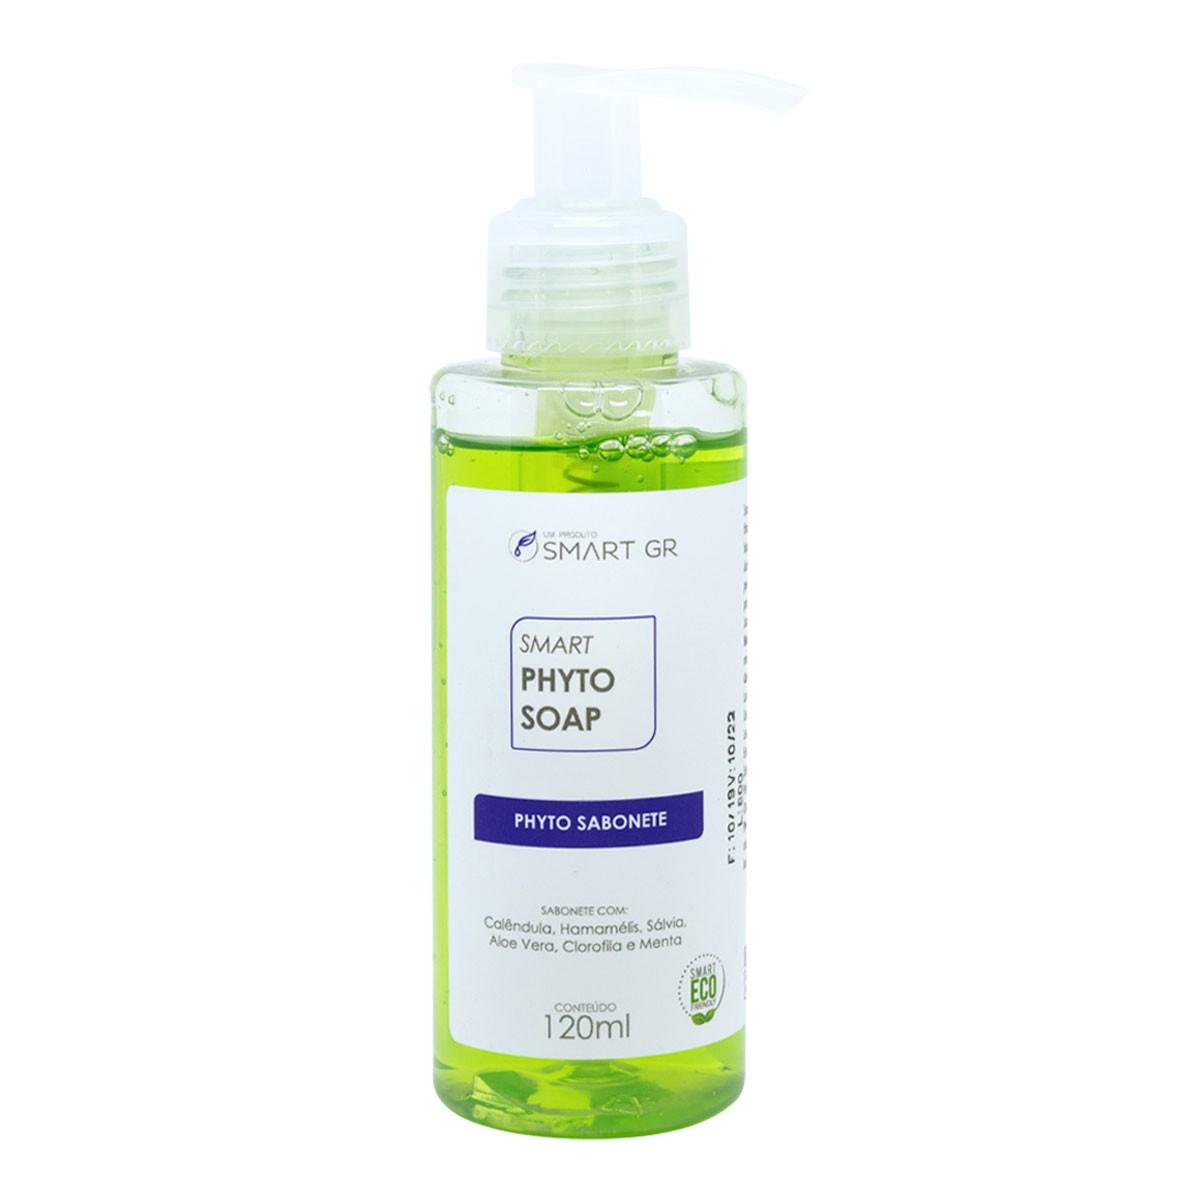 SMART PHYTO SOAP SABONETE DE BIOVEGETAIS FITODETERGENTES 120ML SMART GR